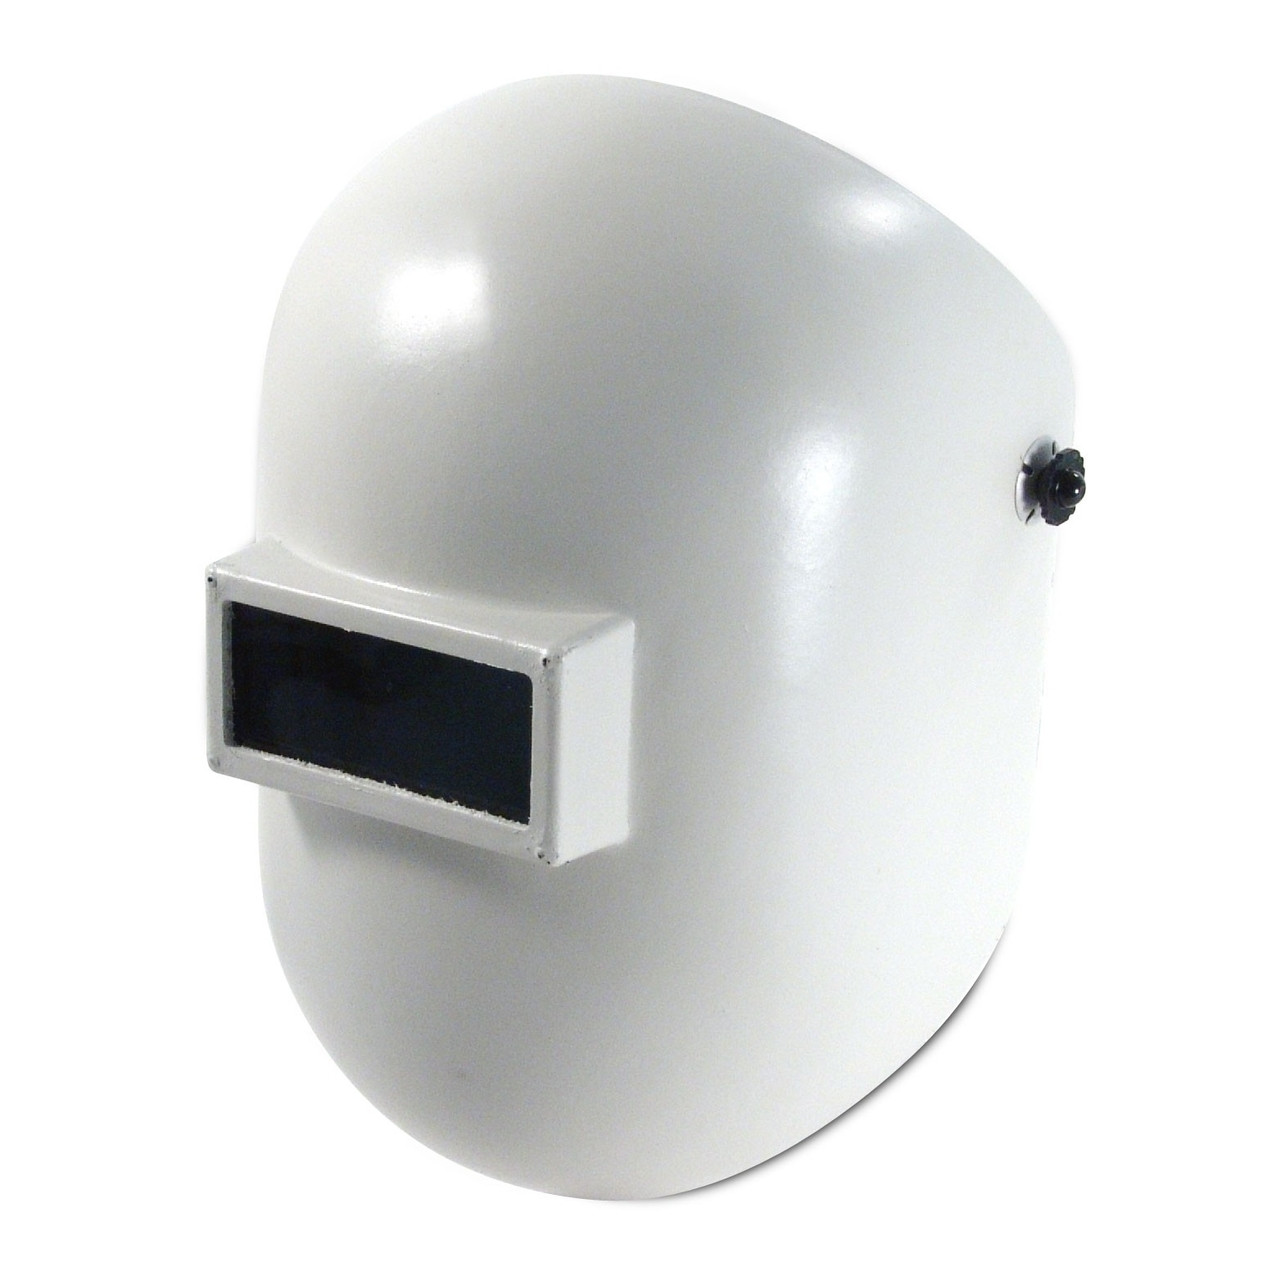 Pipeliner Welding Helmet Accessory Kit